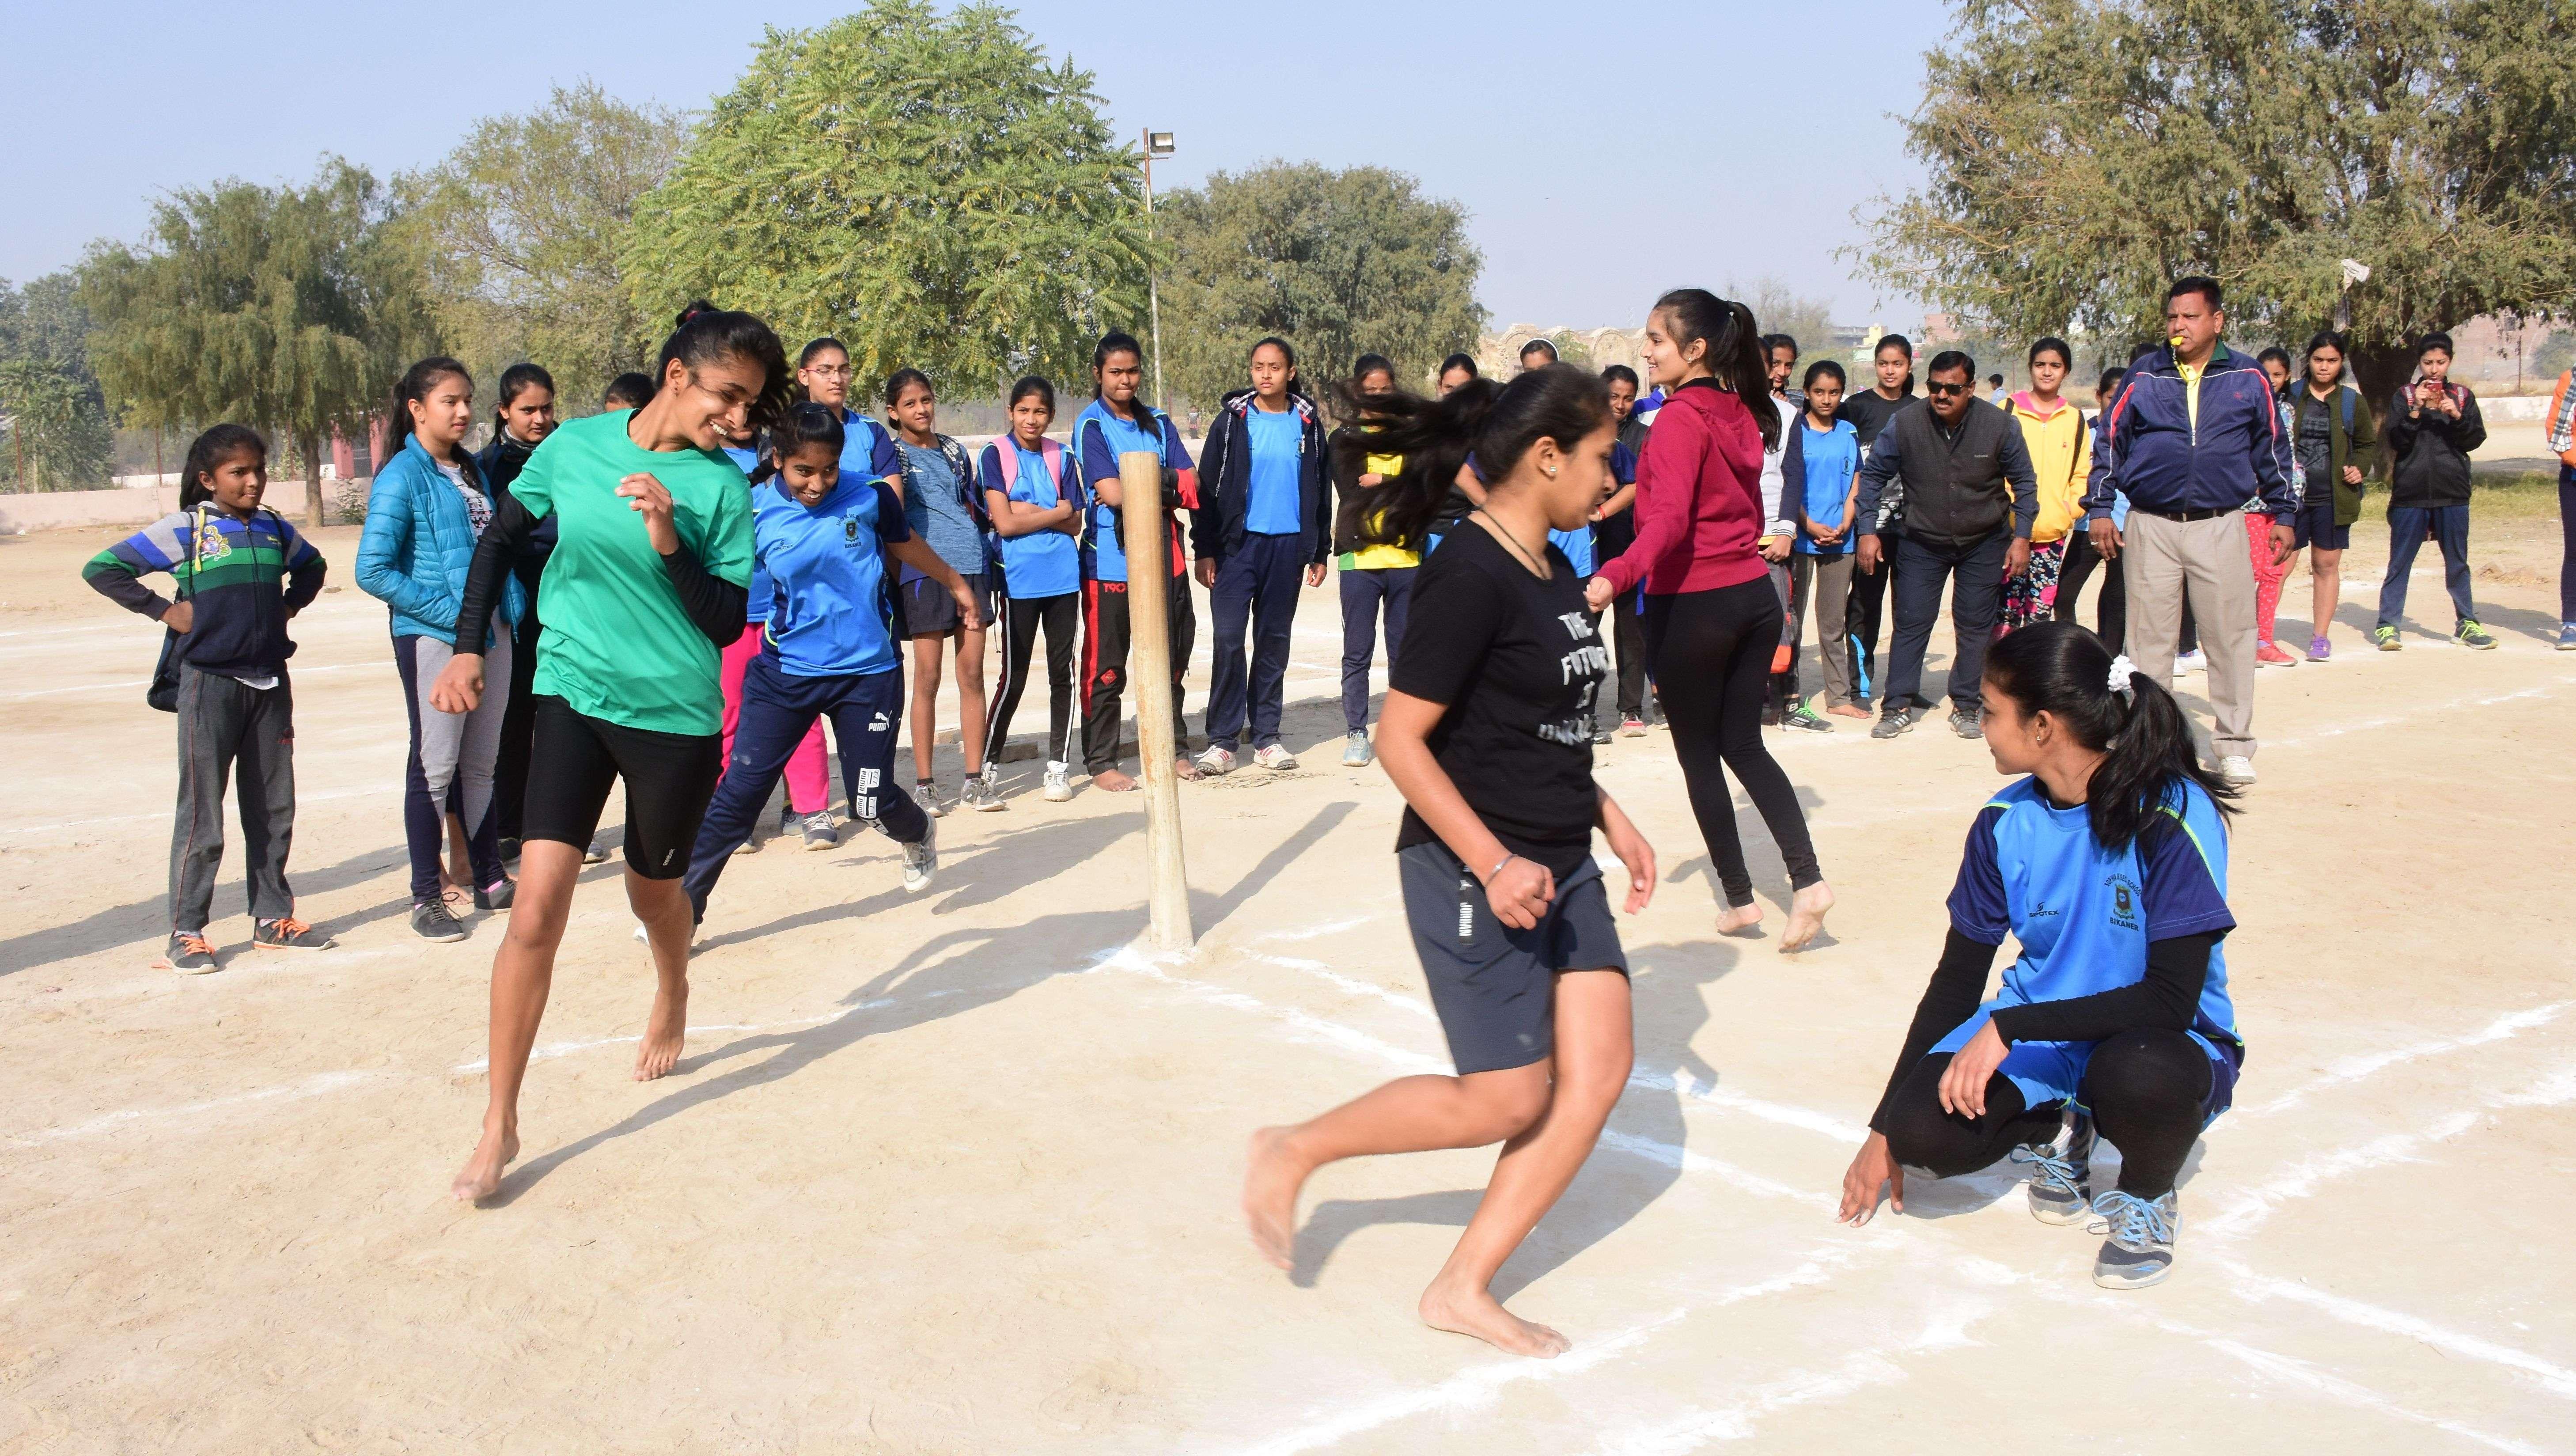 rajasthan patrika Pie School Olympics 2019 in bikaner